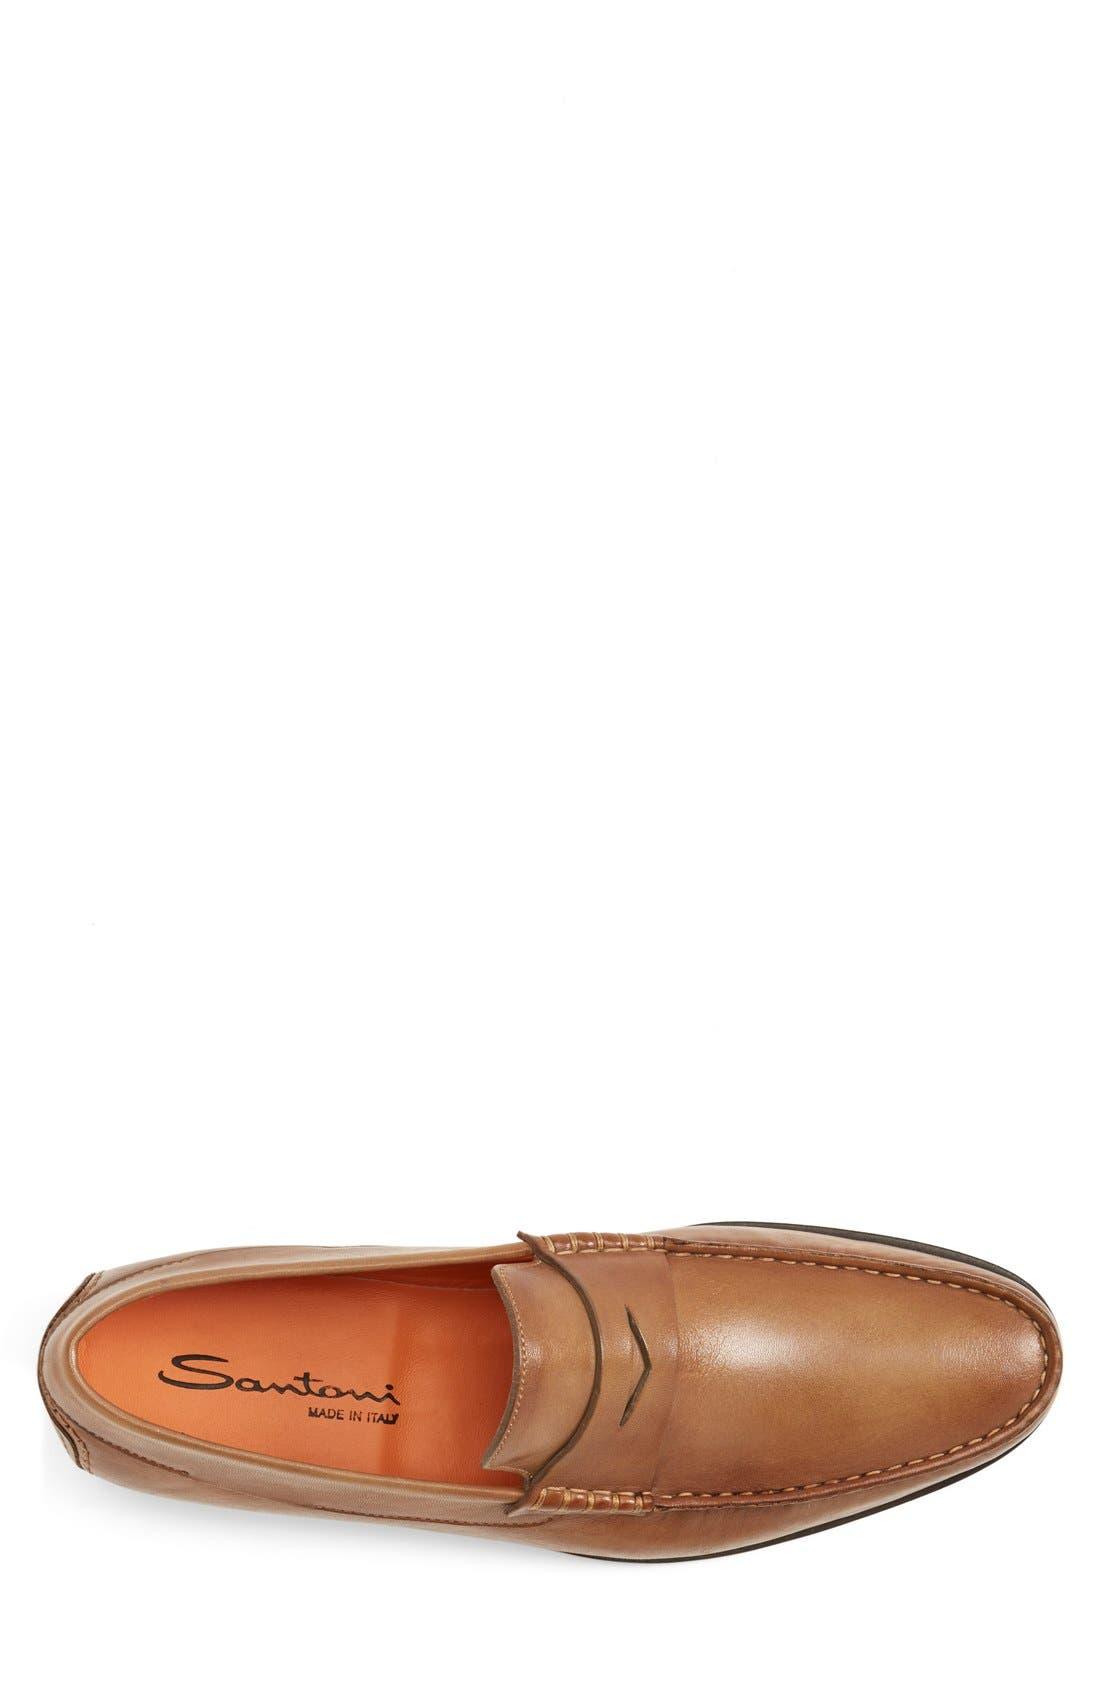 SANTONI,                             'Turner' Leather Penny Loafer,                             Alternate thumbnail 3, color,                             270